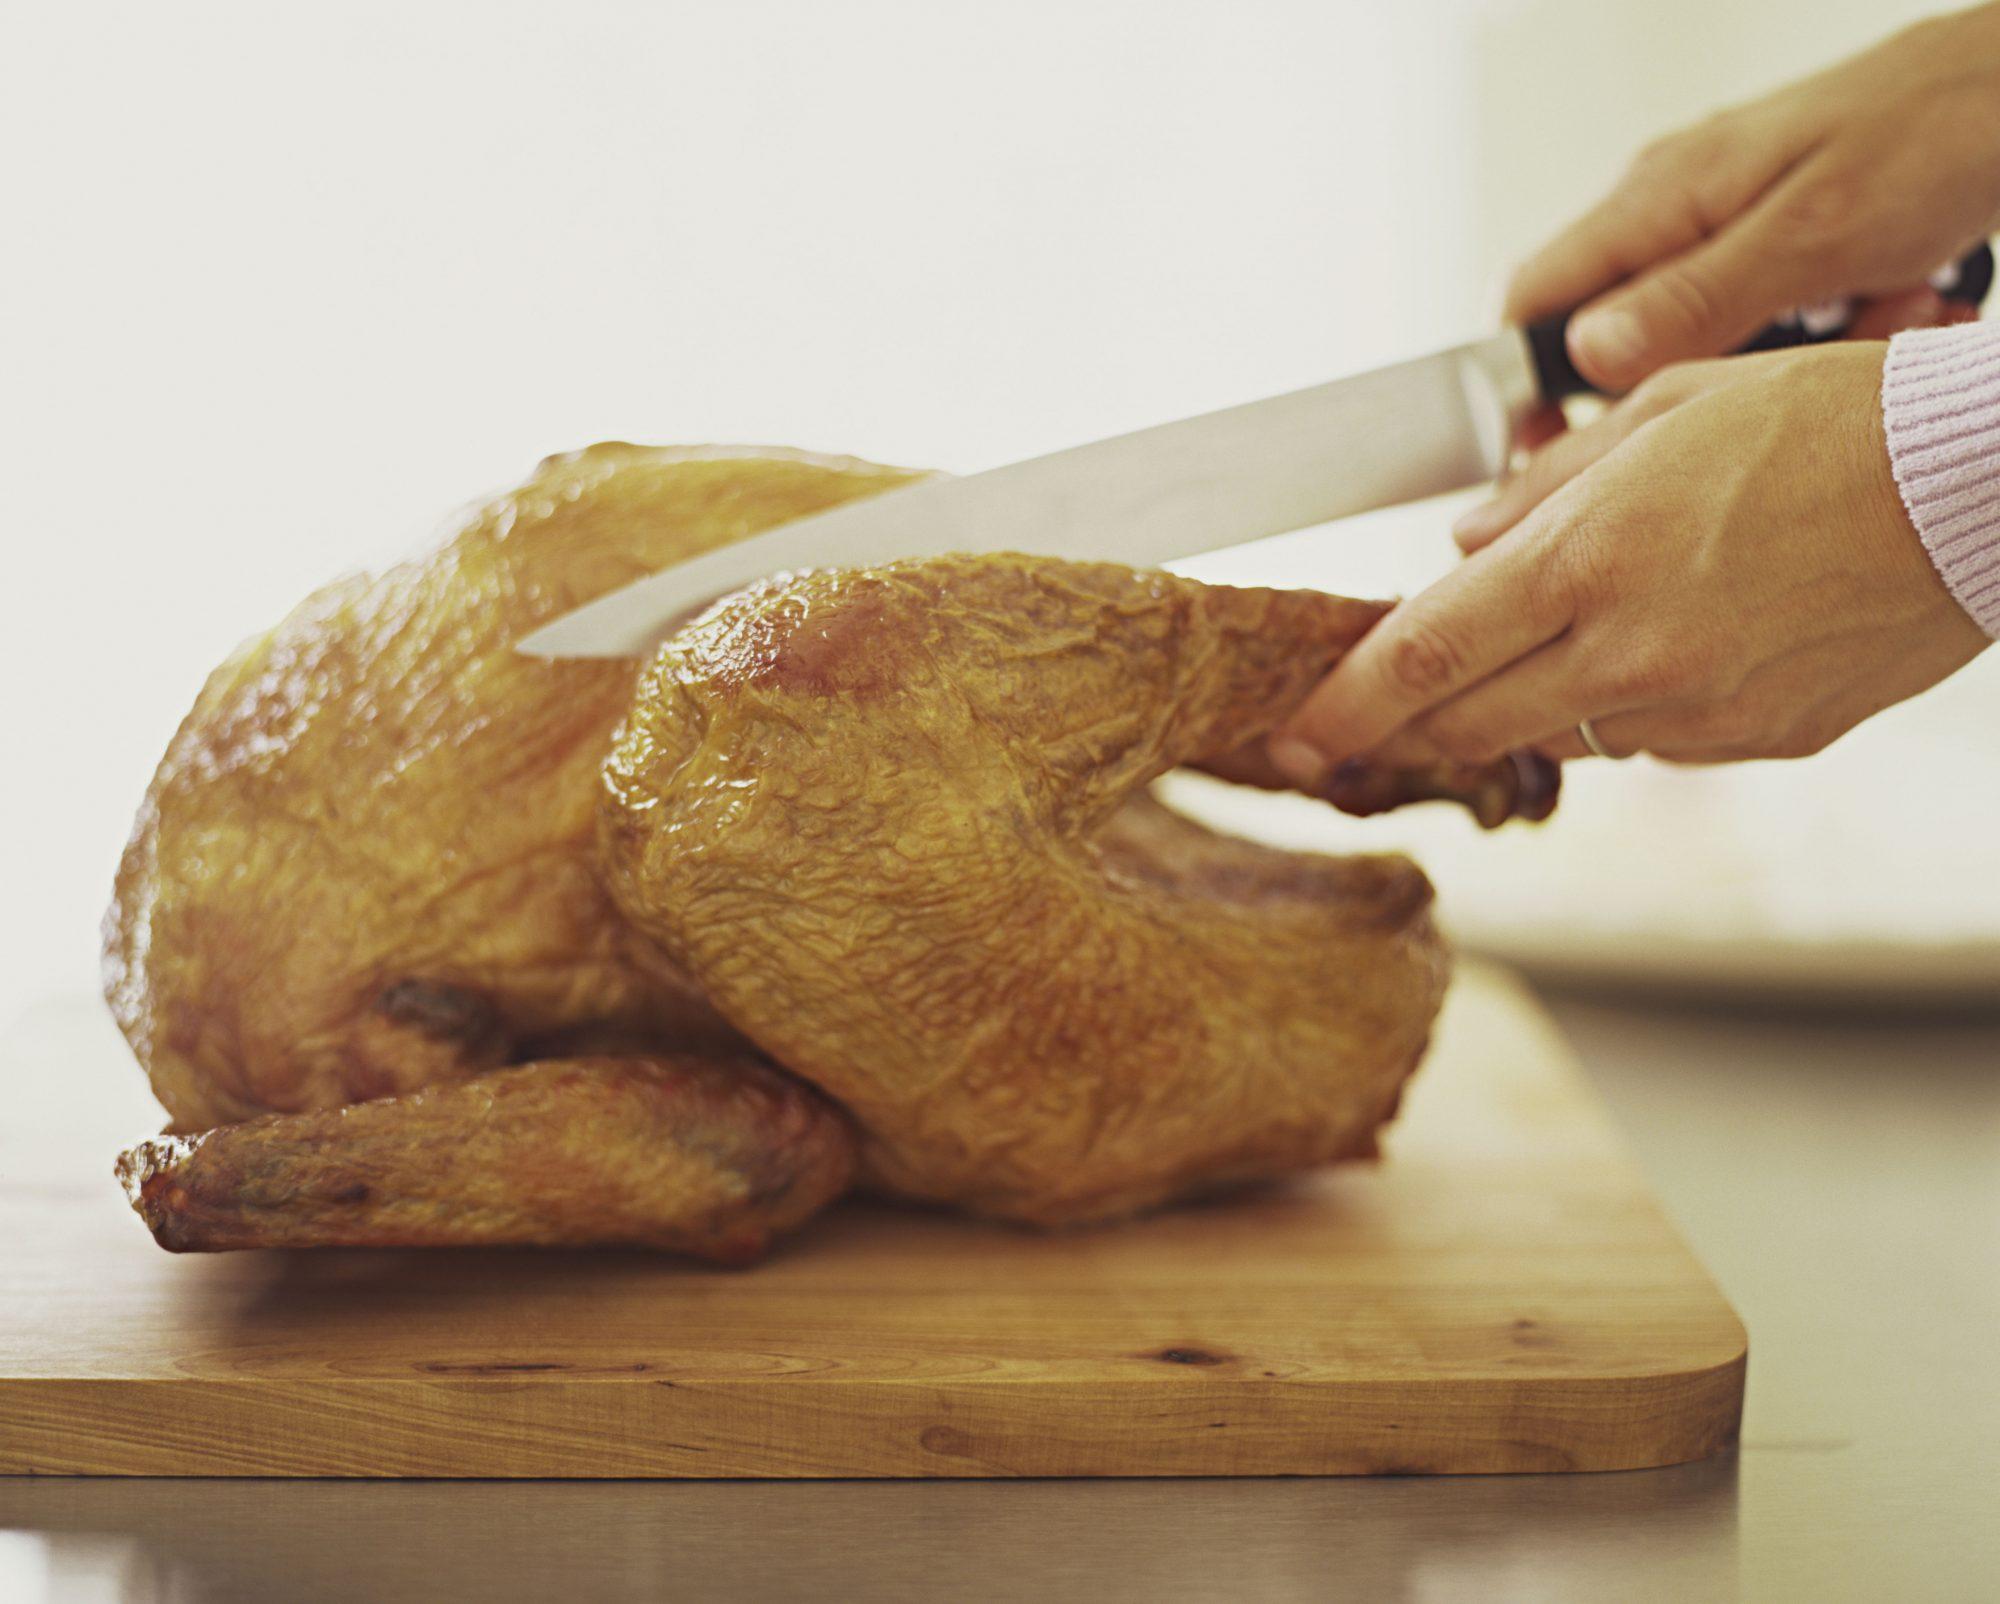 Carving a turkey Getty 8/6/20